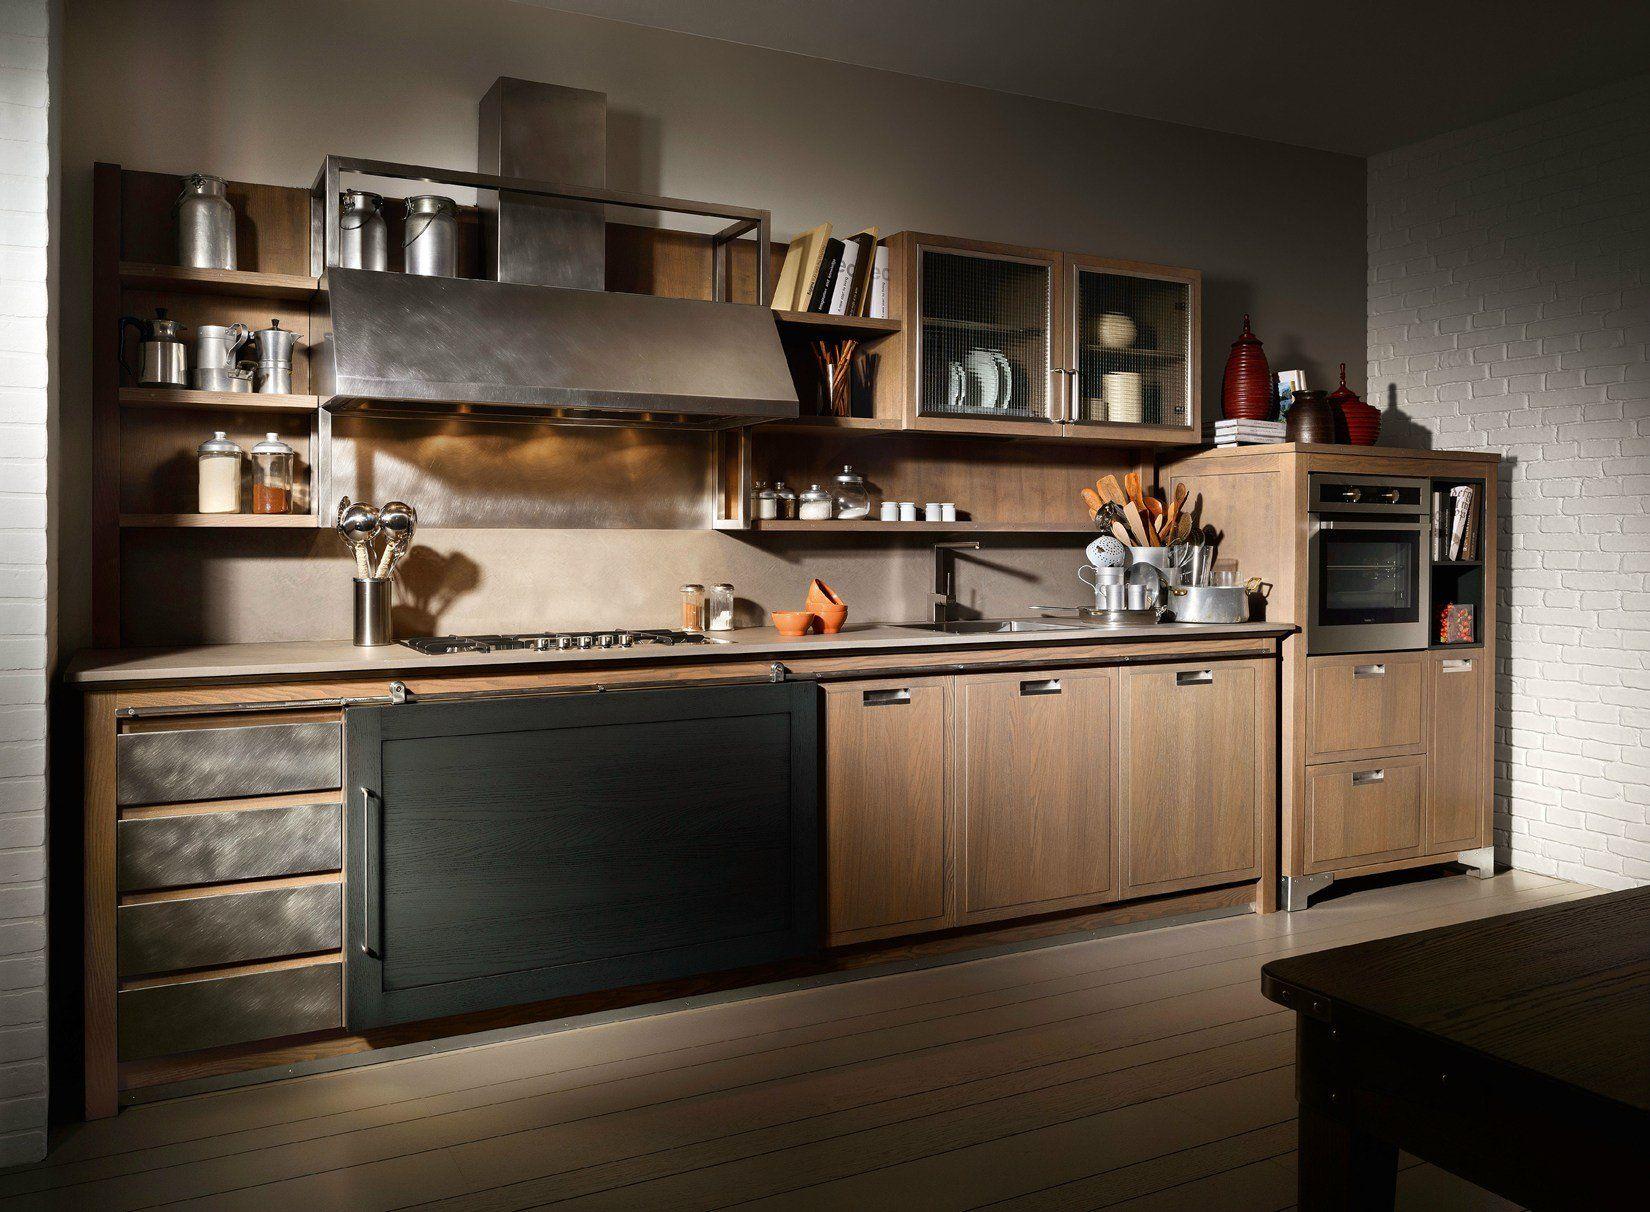 Favoloso Best Cucine Colombini Opinioni Ideas - Skilifts.us - skilifts.us EH95